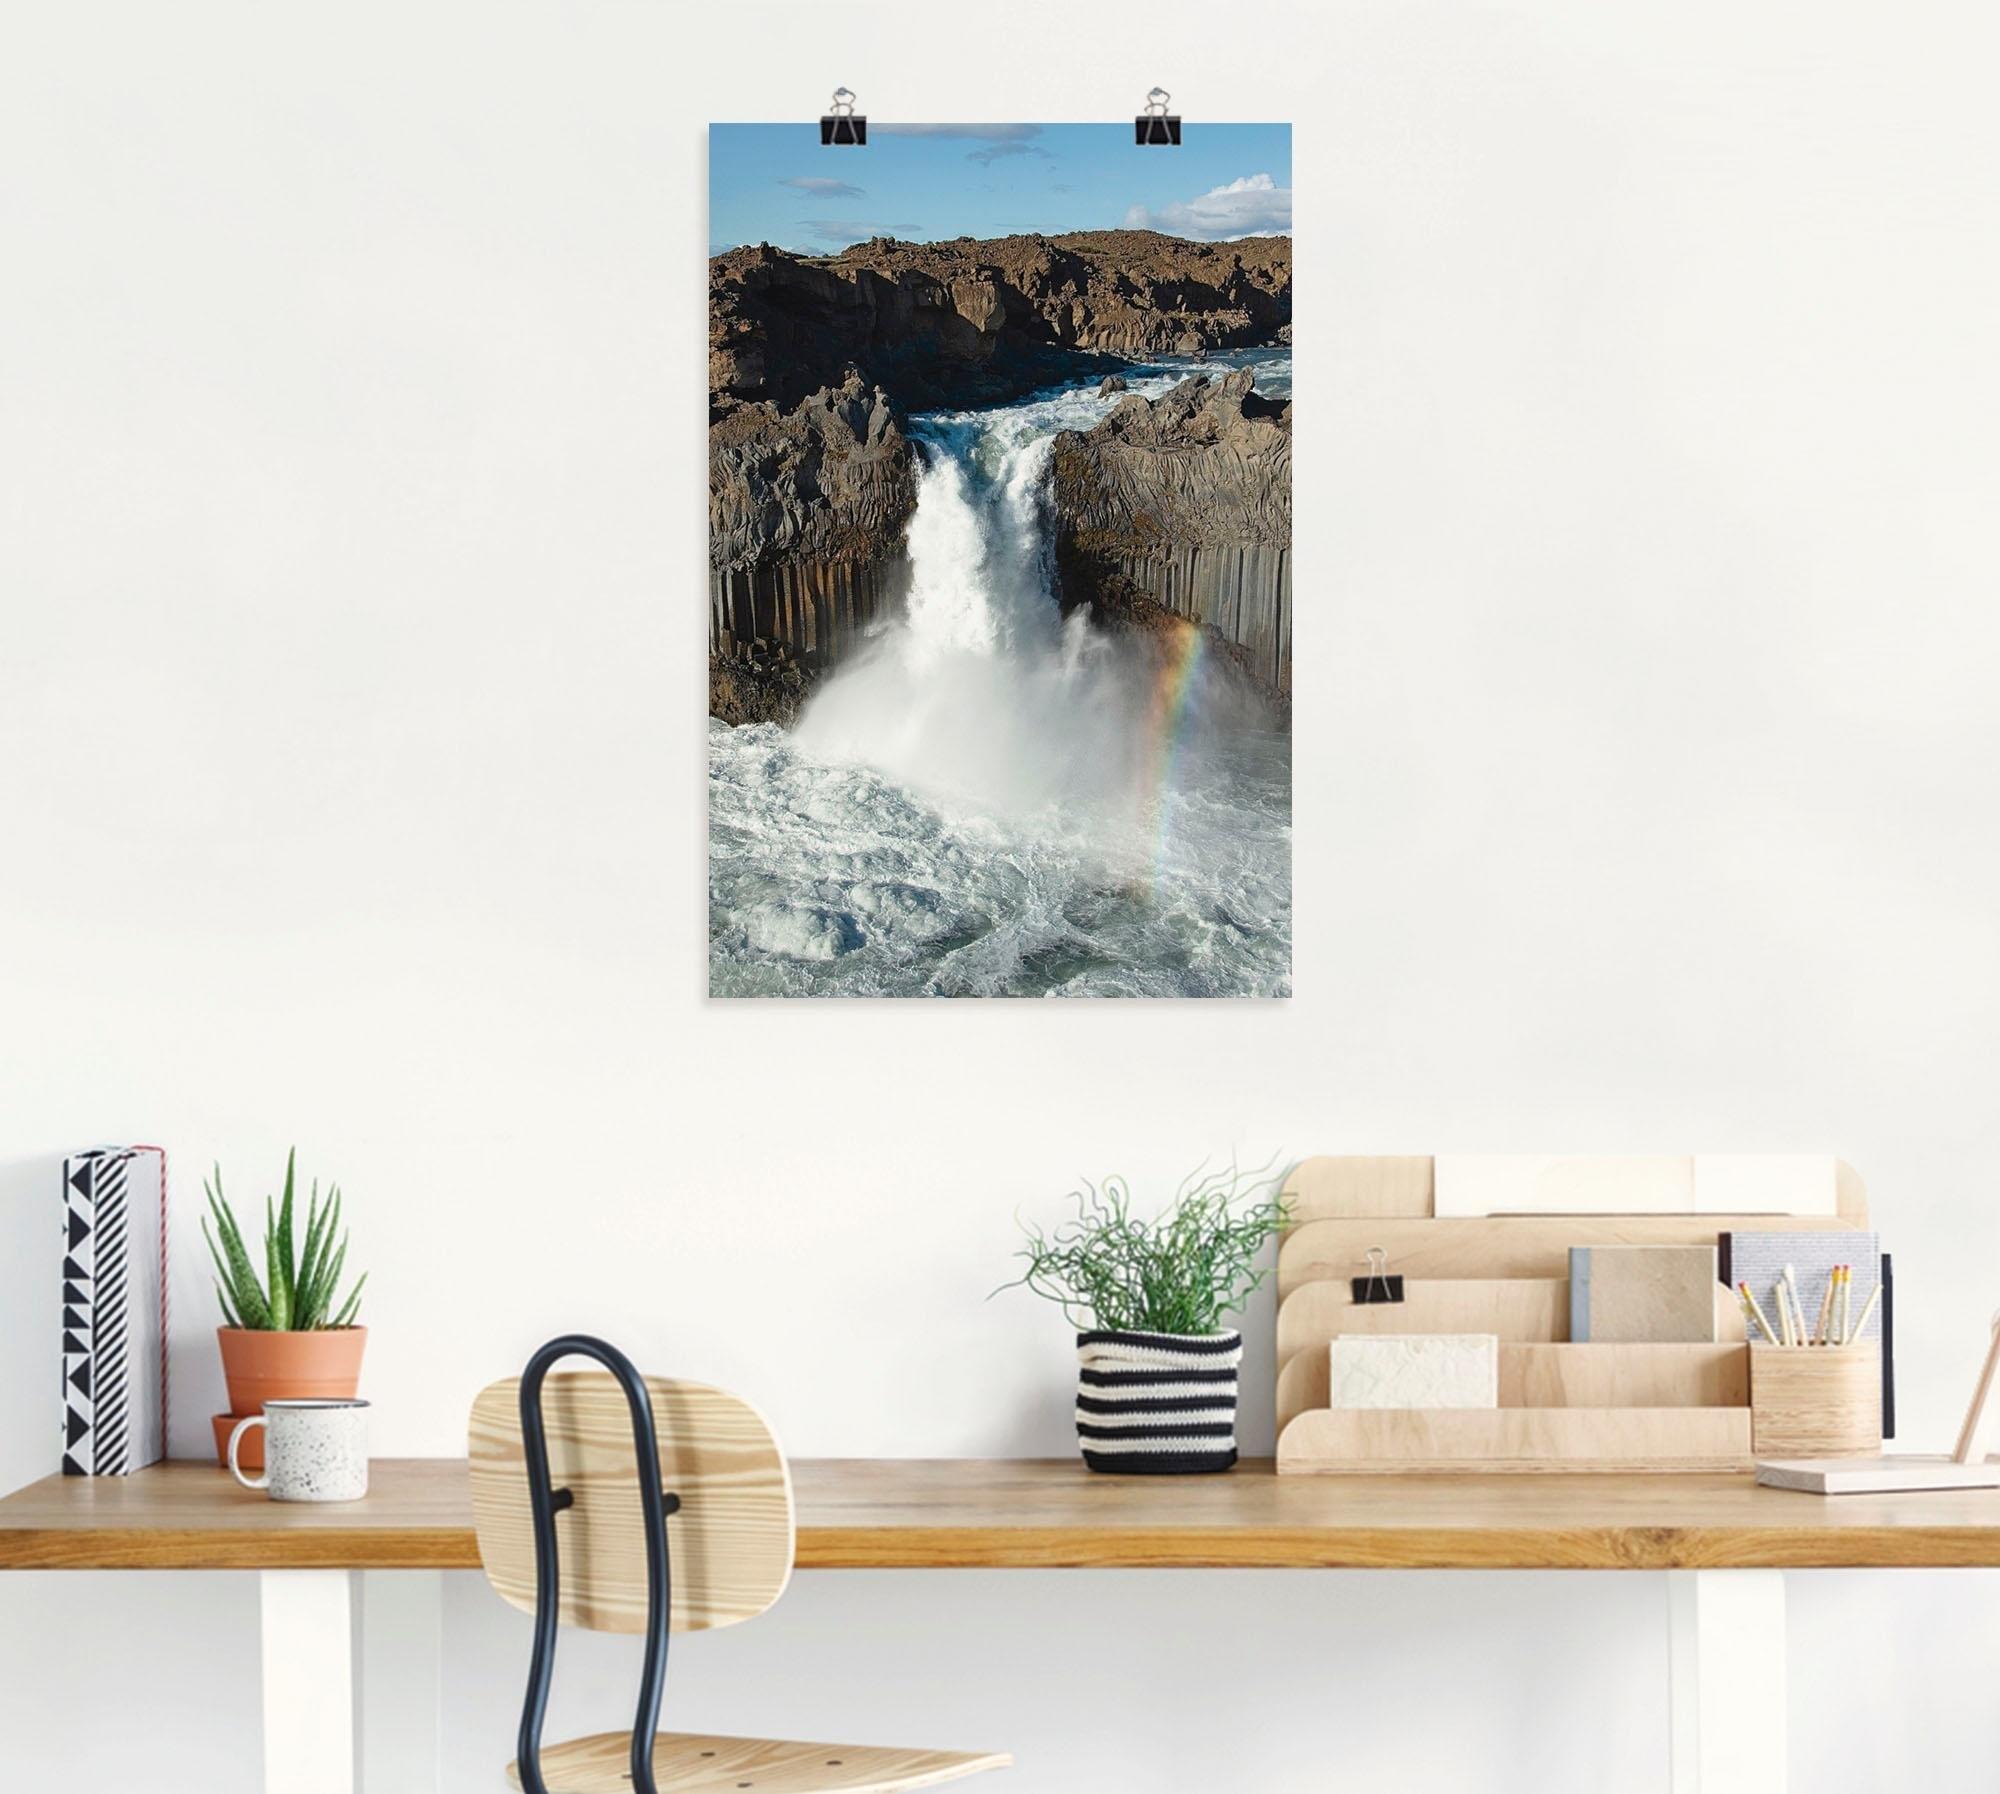 Artland artprint »Wasserfall II« goedkoop op otto.nl kopen